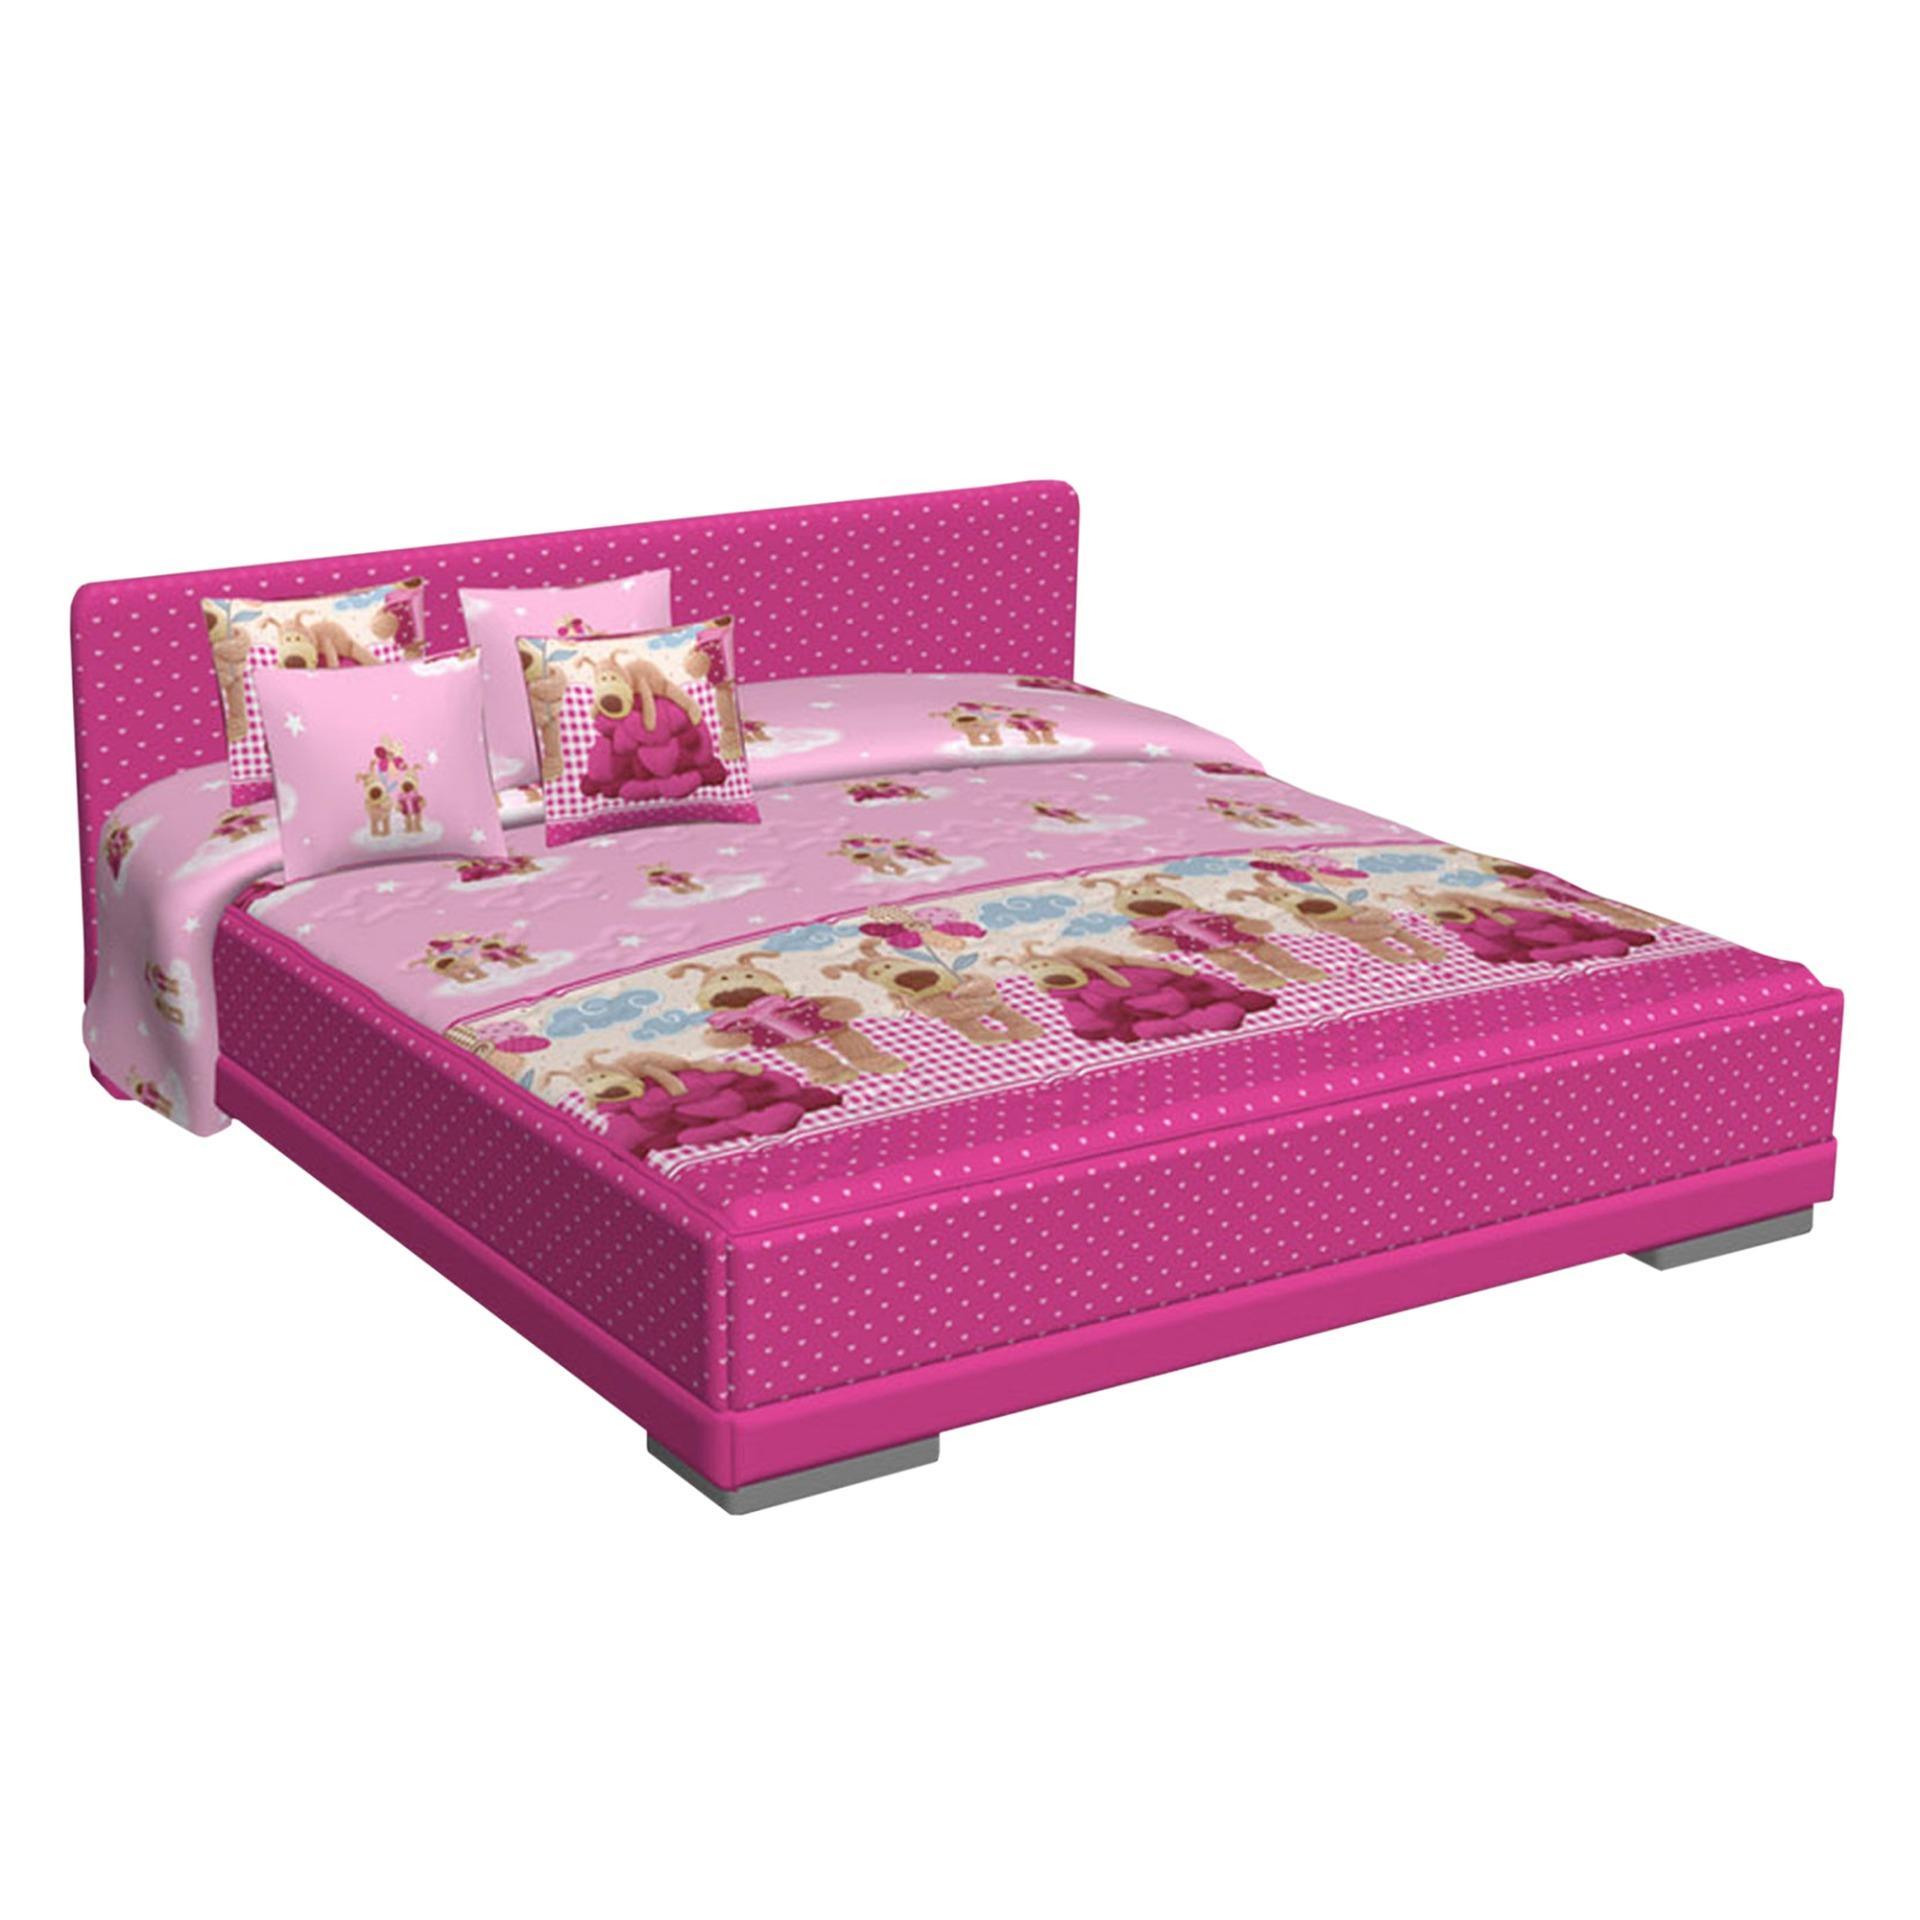 Quantum Springbed Millennium Teen HB Charlton Size 90 x 200 - Full Set - Pink -